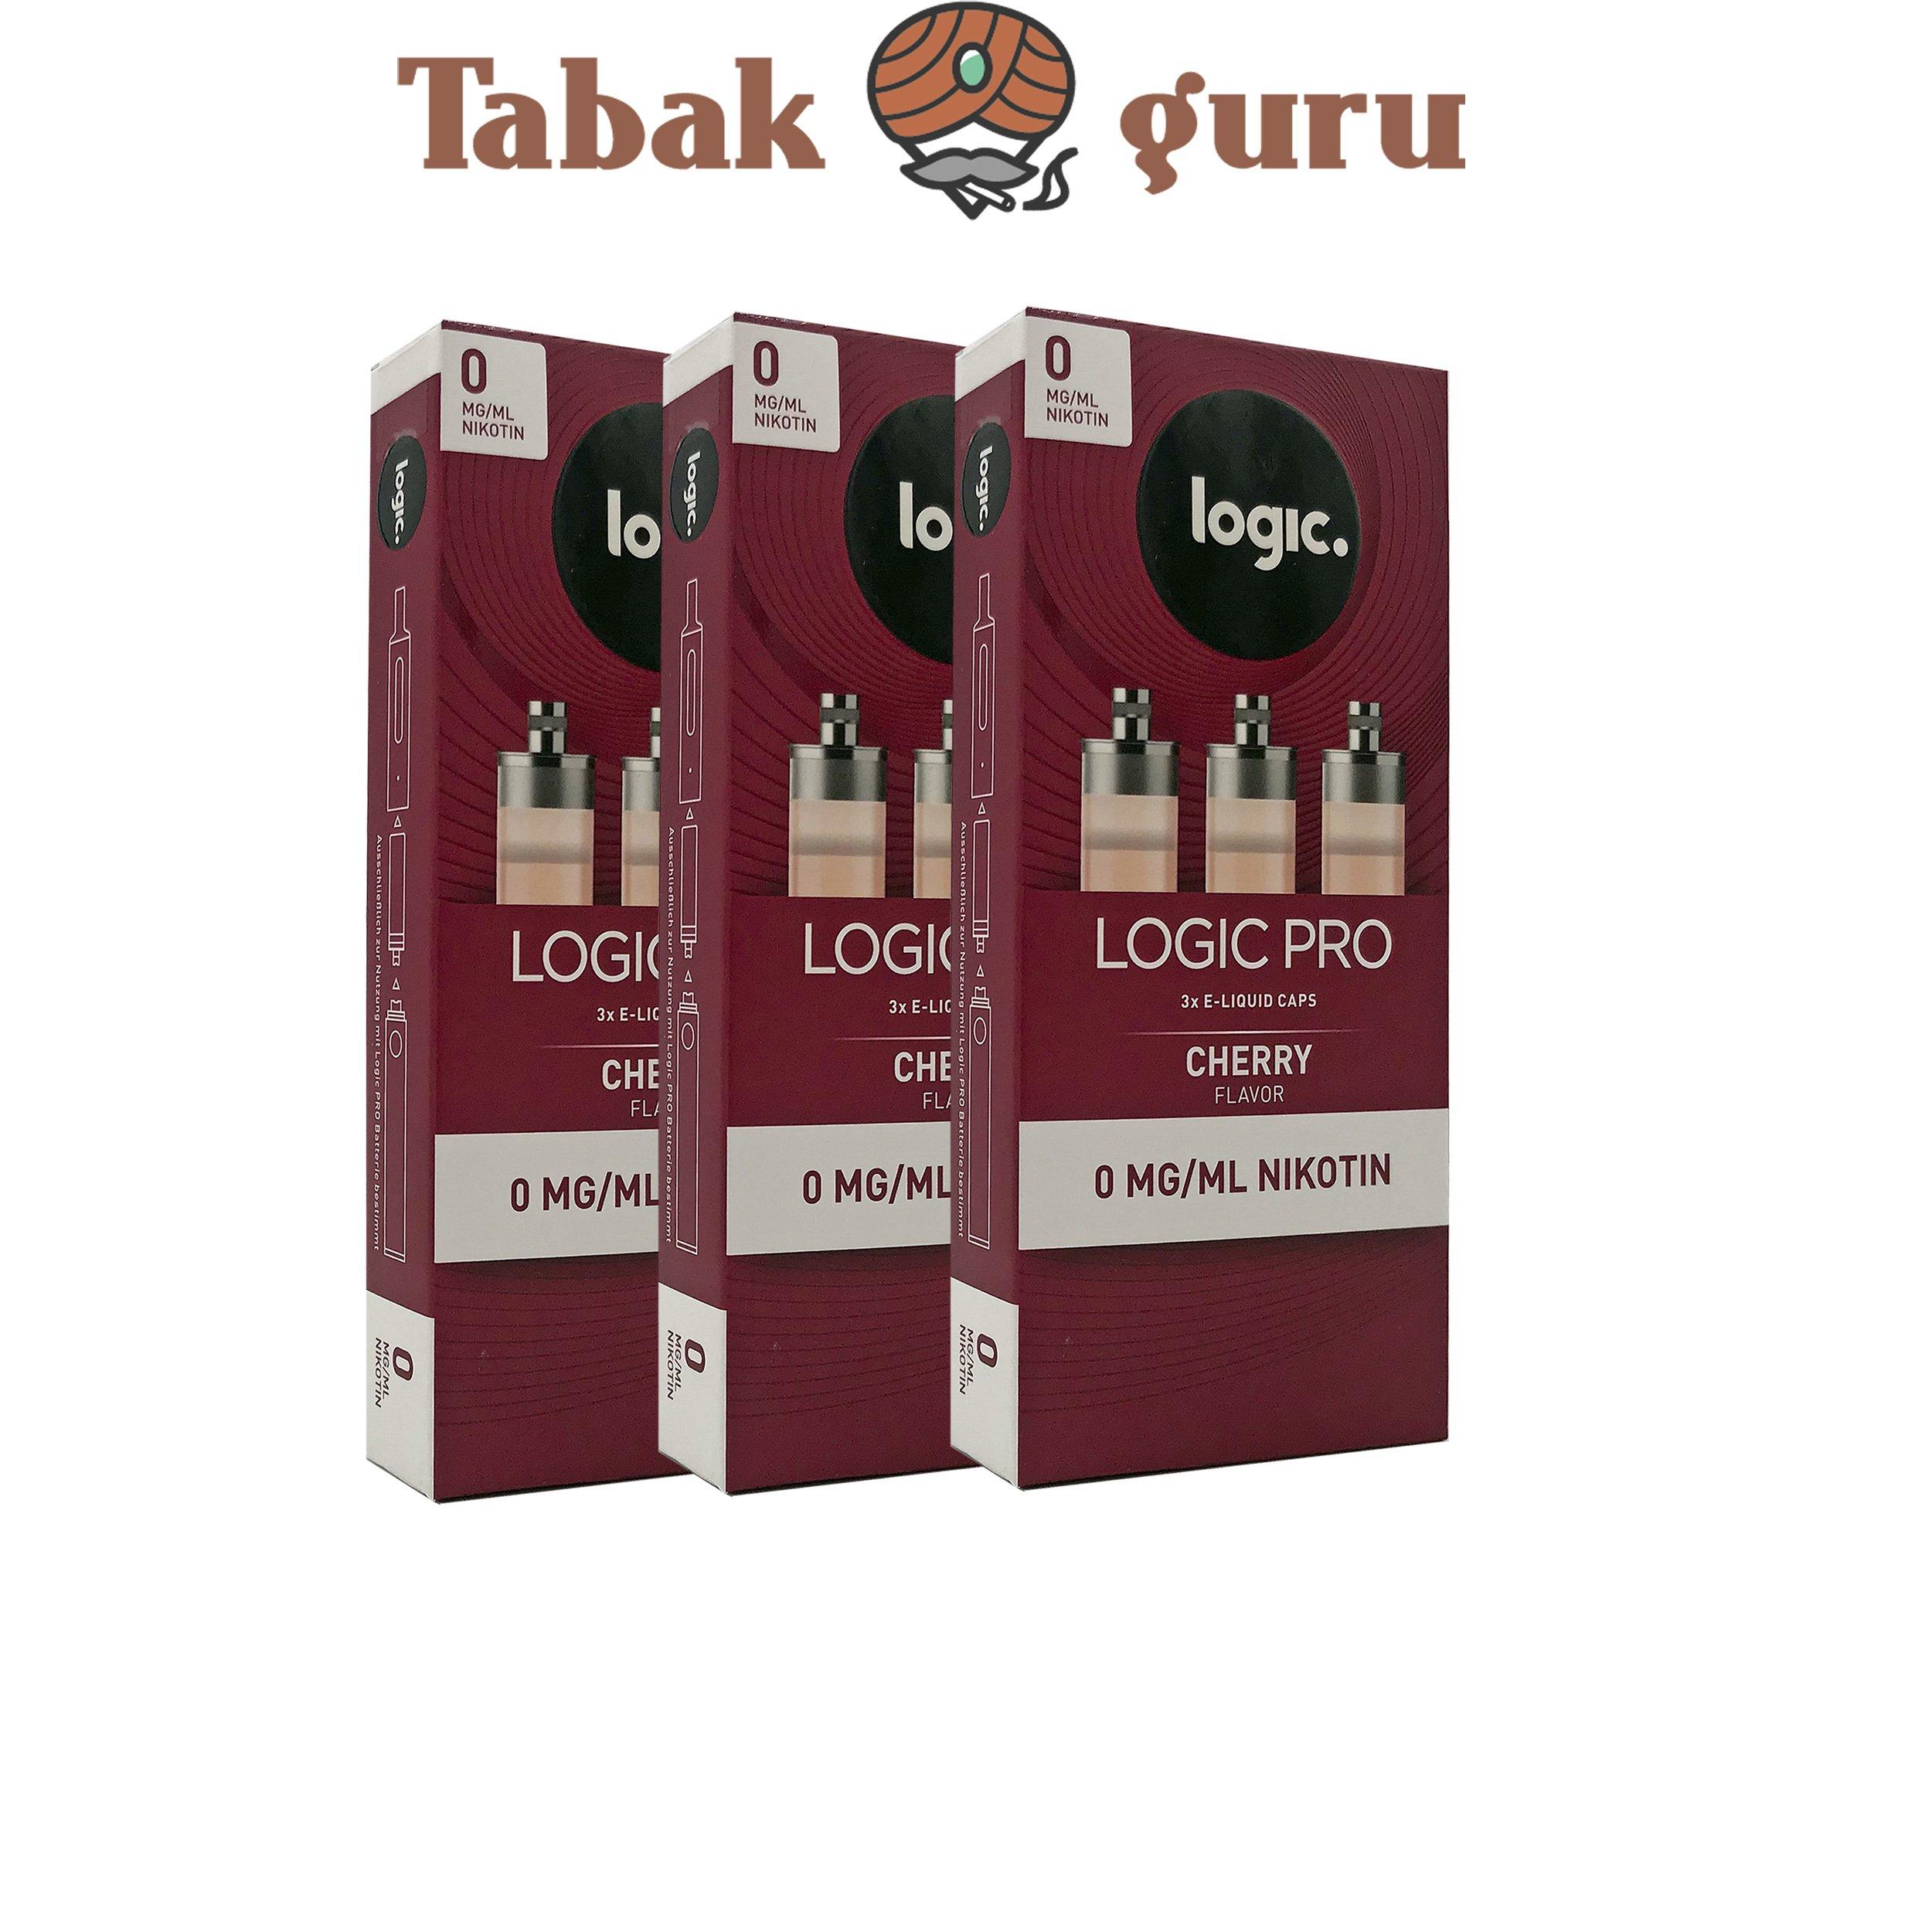 Logic Pro e-Liquid 3x 3er Caps Cherry Flavor 0 mg/ml